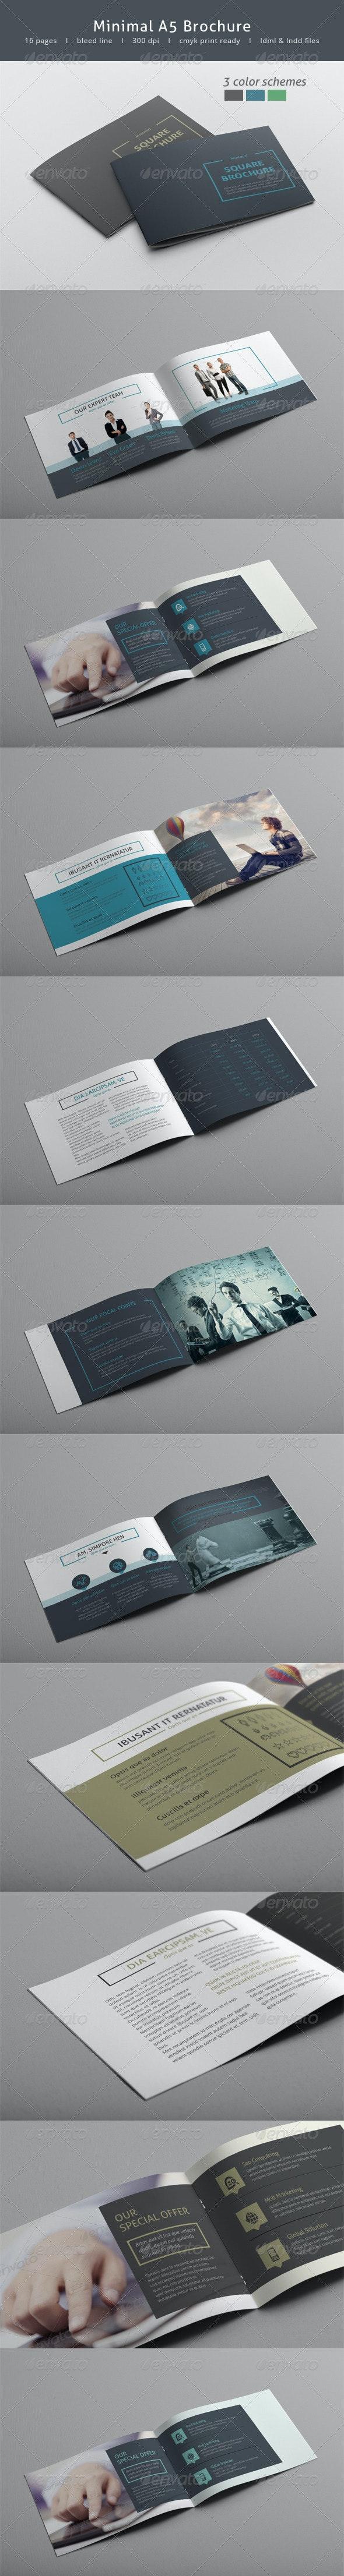 Minimal A5 Brochure - Informational Brochures